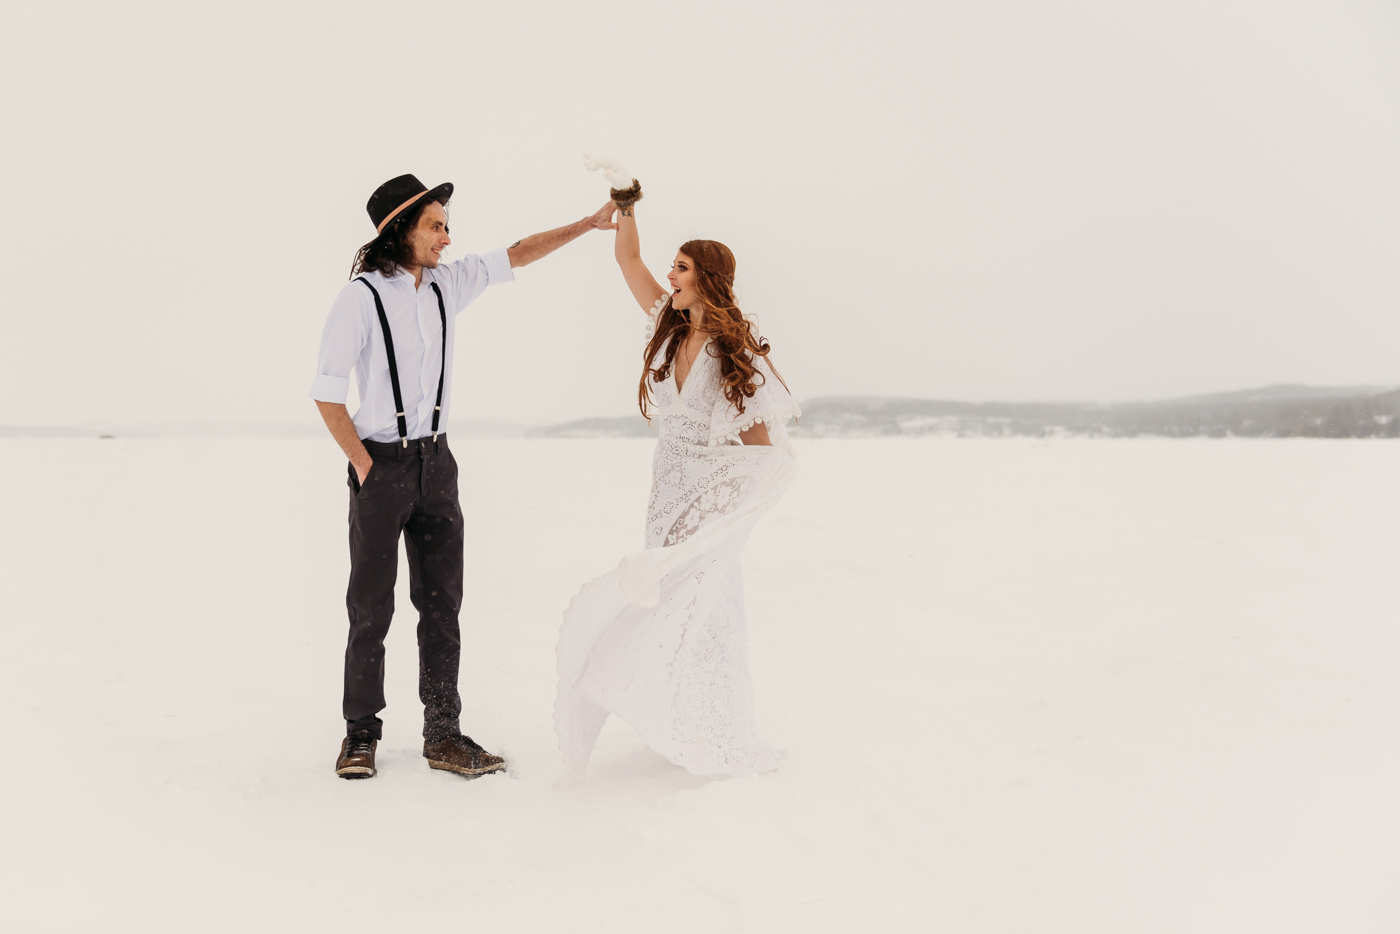 FortSt.John_photographer_TyraEPhotography_Wedding_Couple_Family_Photograhy_DawsonCreek_Elopement_Bride_Boduoir_Portraits-5020.jpg